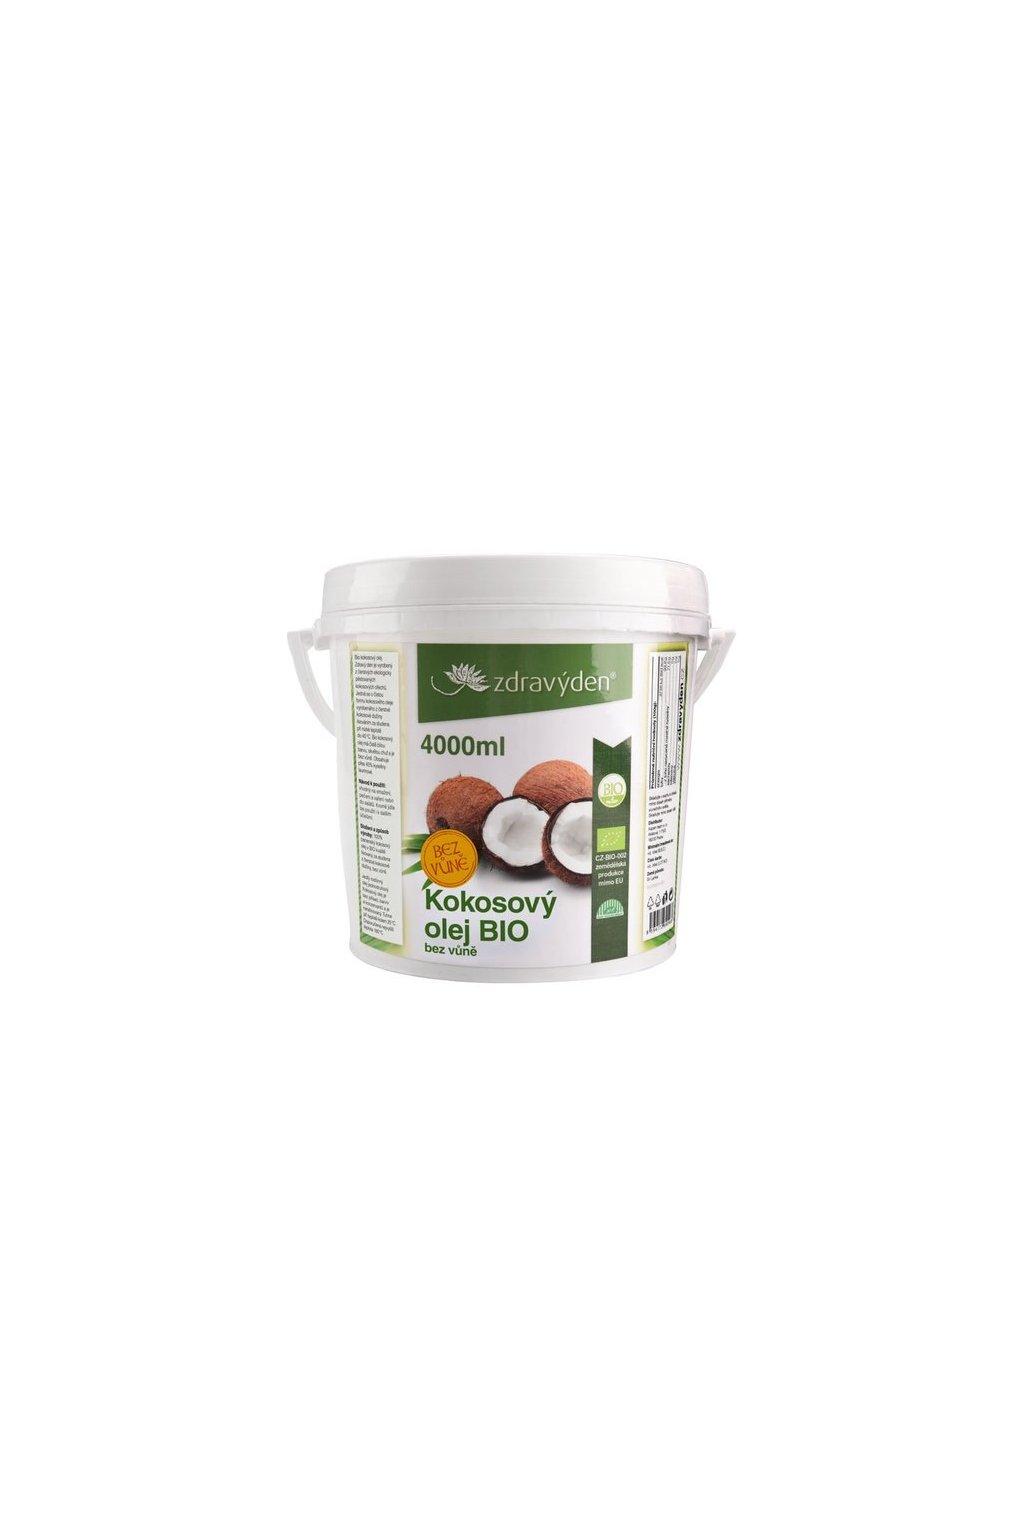 kokosovy olej bio 4000ml